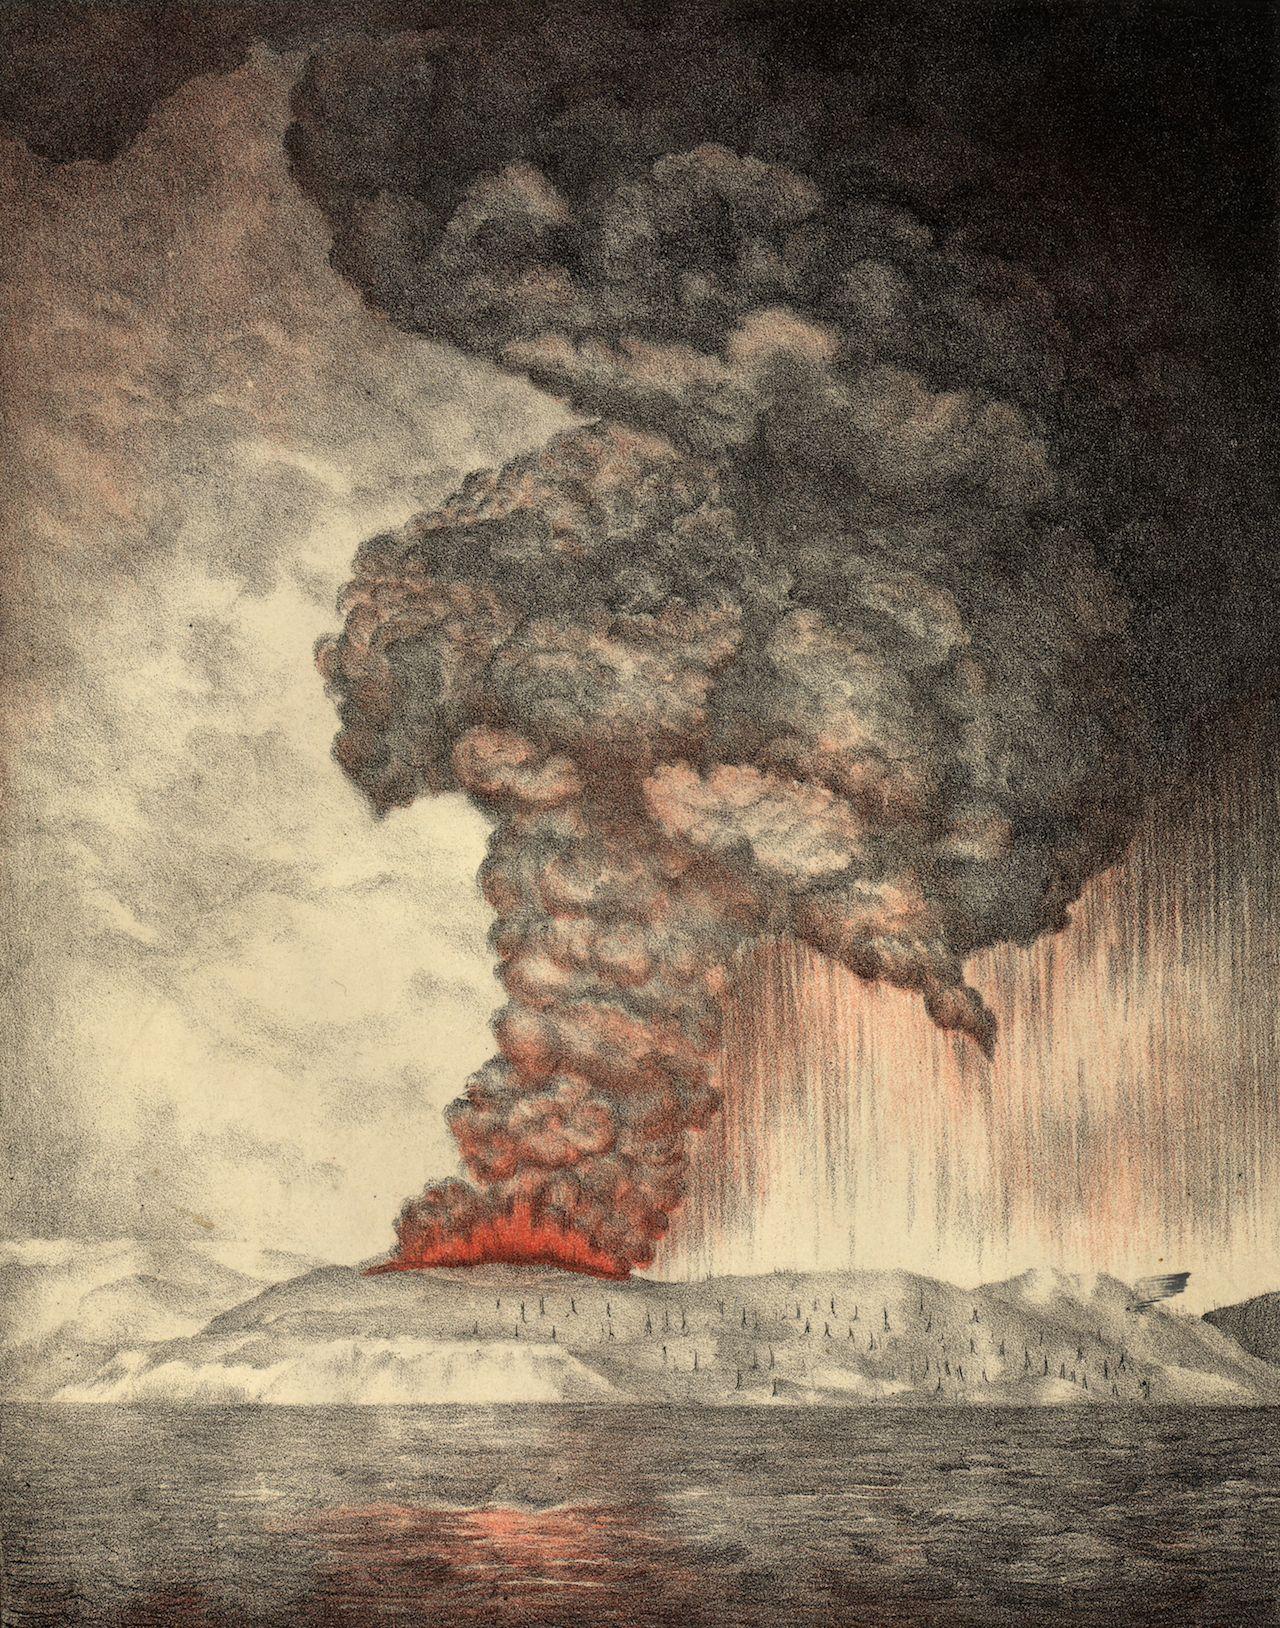 An 1888 lithograph of the 1883 eruption of Krakatoa (Parker & Coward, Britain, via Wikimedia)